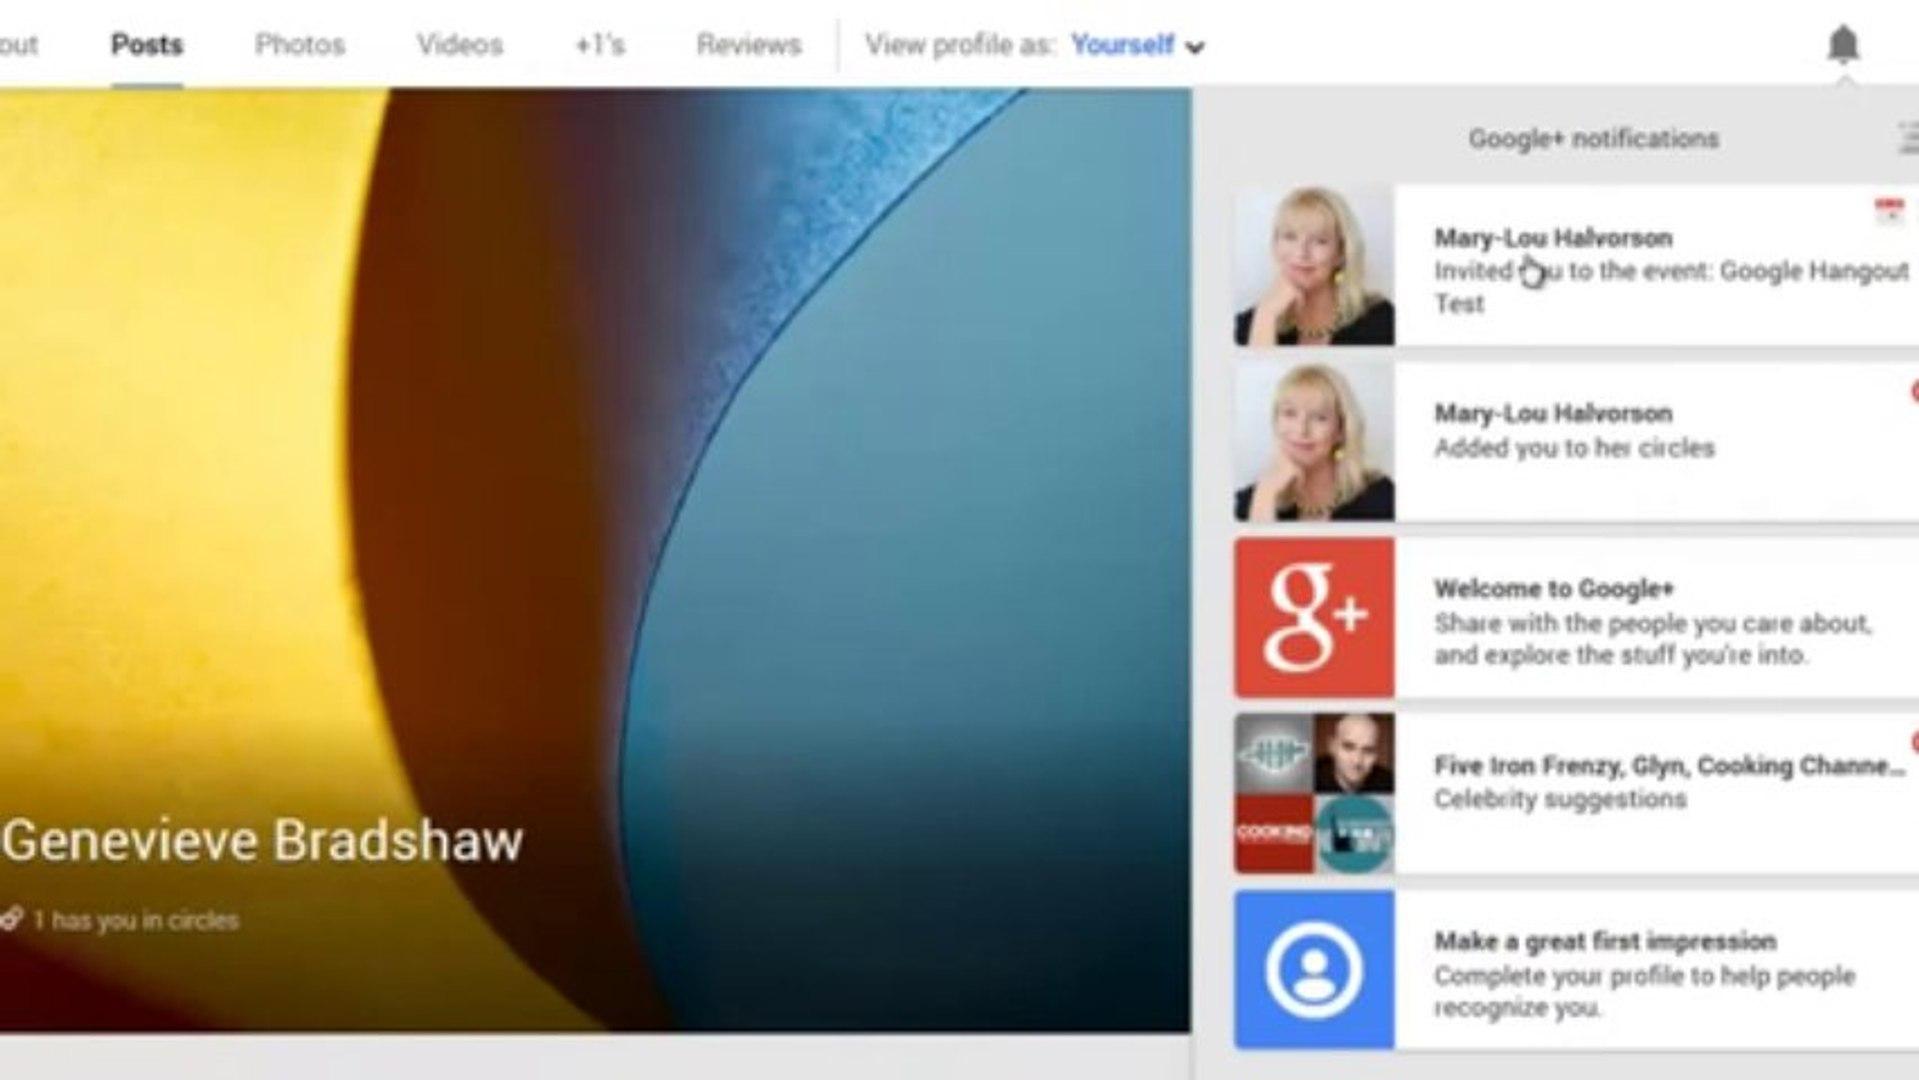 Google Hangout Event Tutorial October 2013 - How to Set Up and Respond to Google Hangout Event